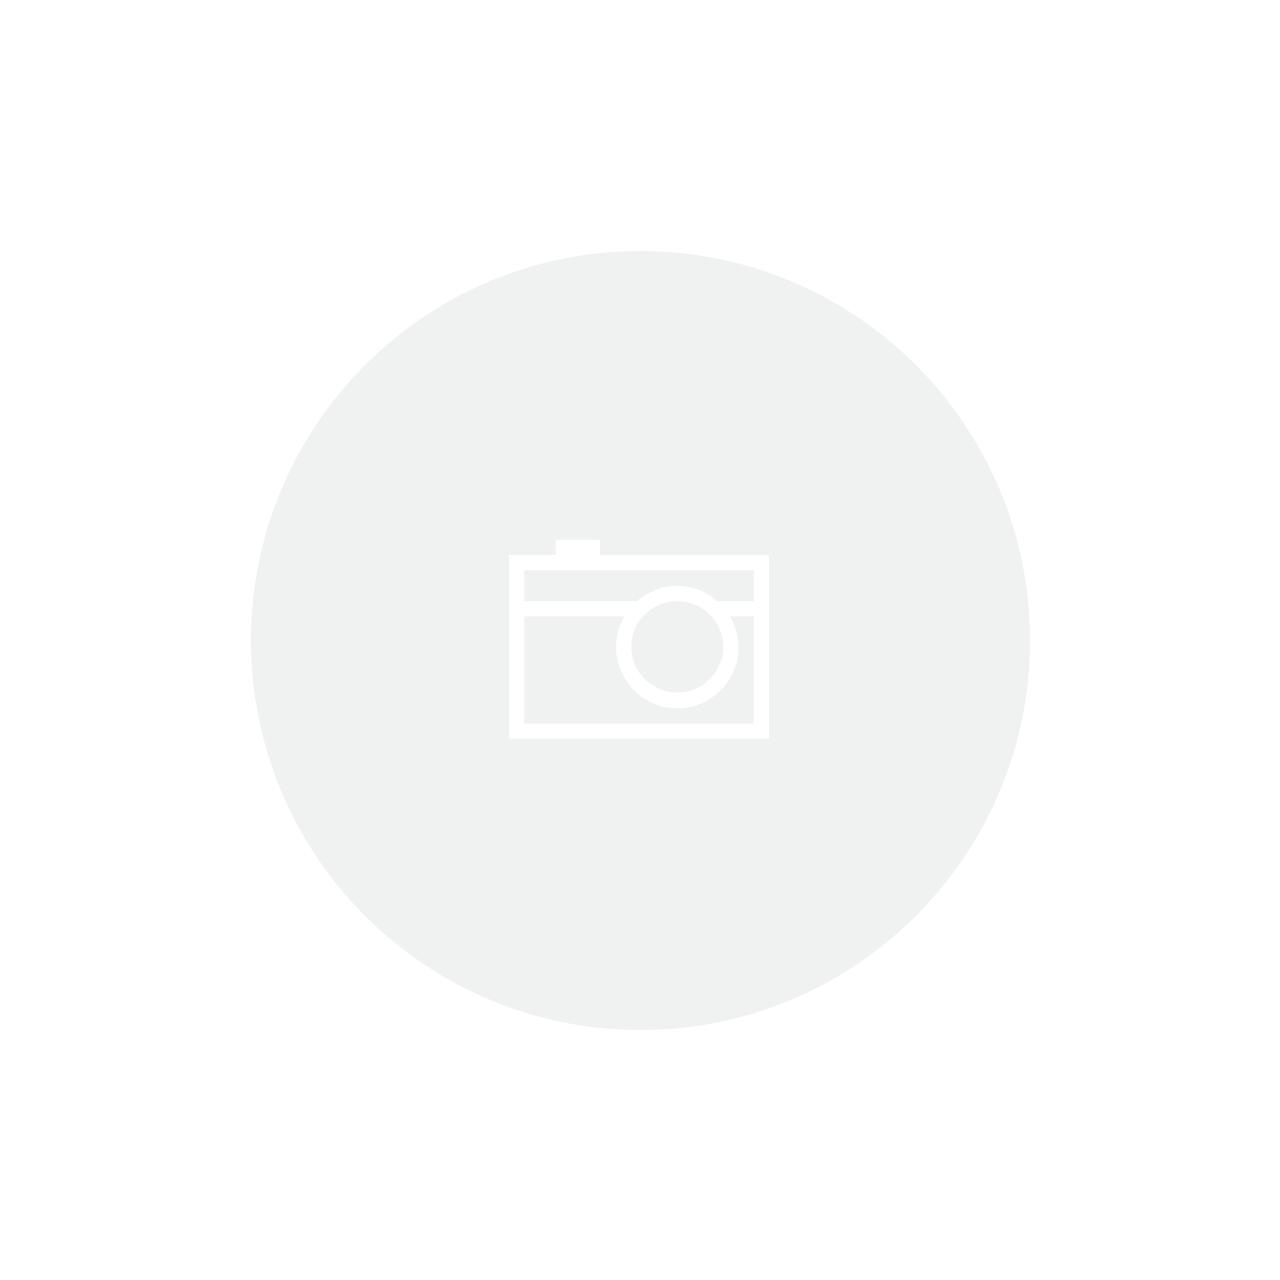 Batedor Manual Preto Utilita Tramontina